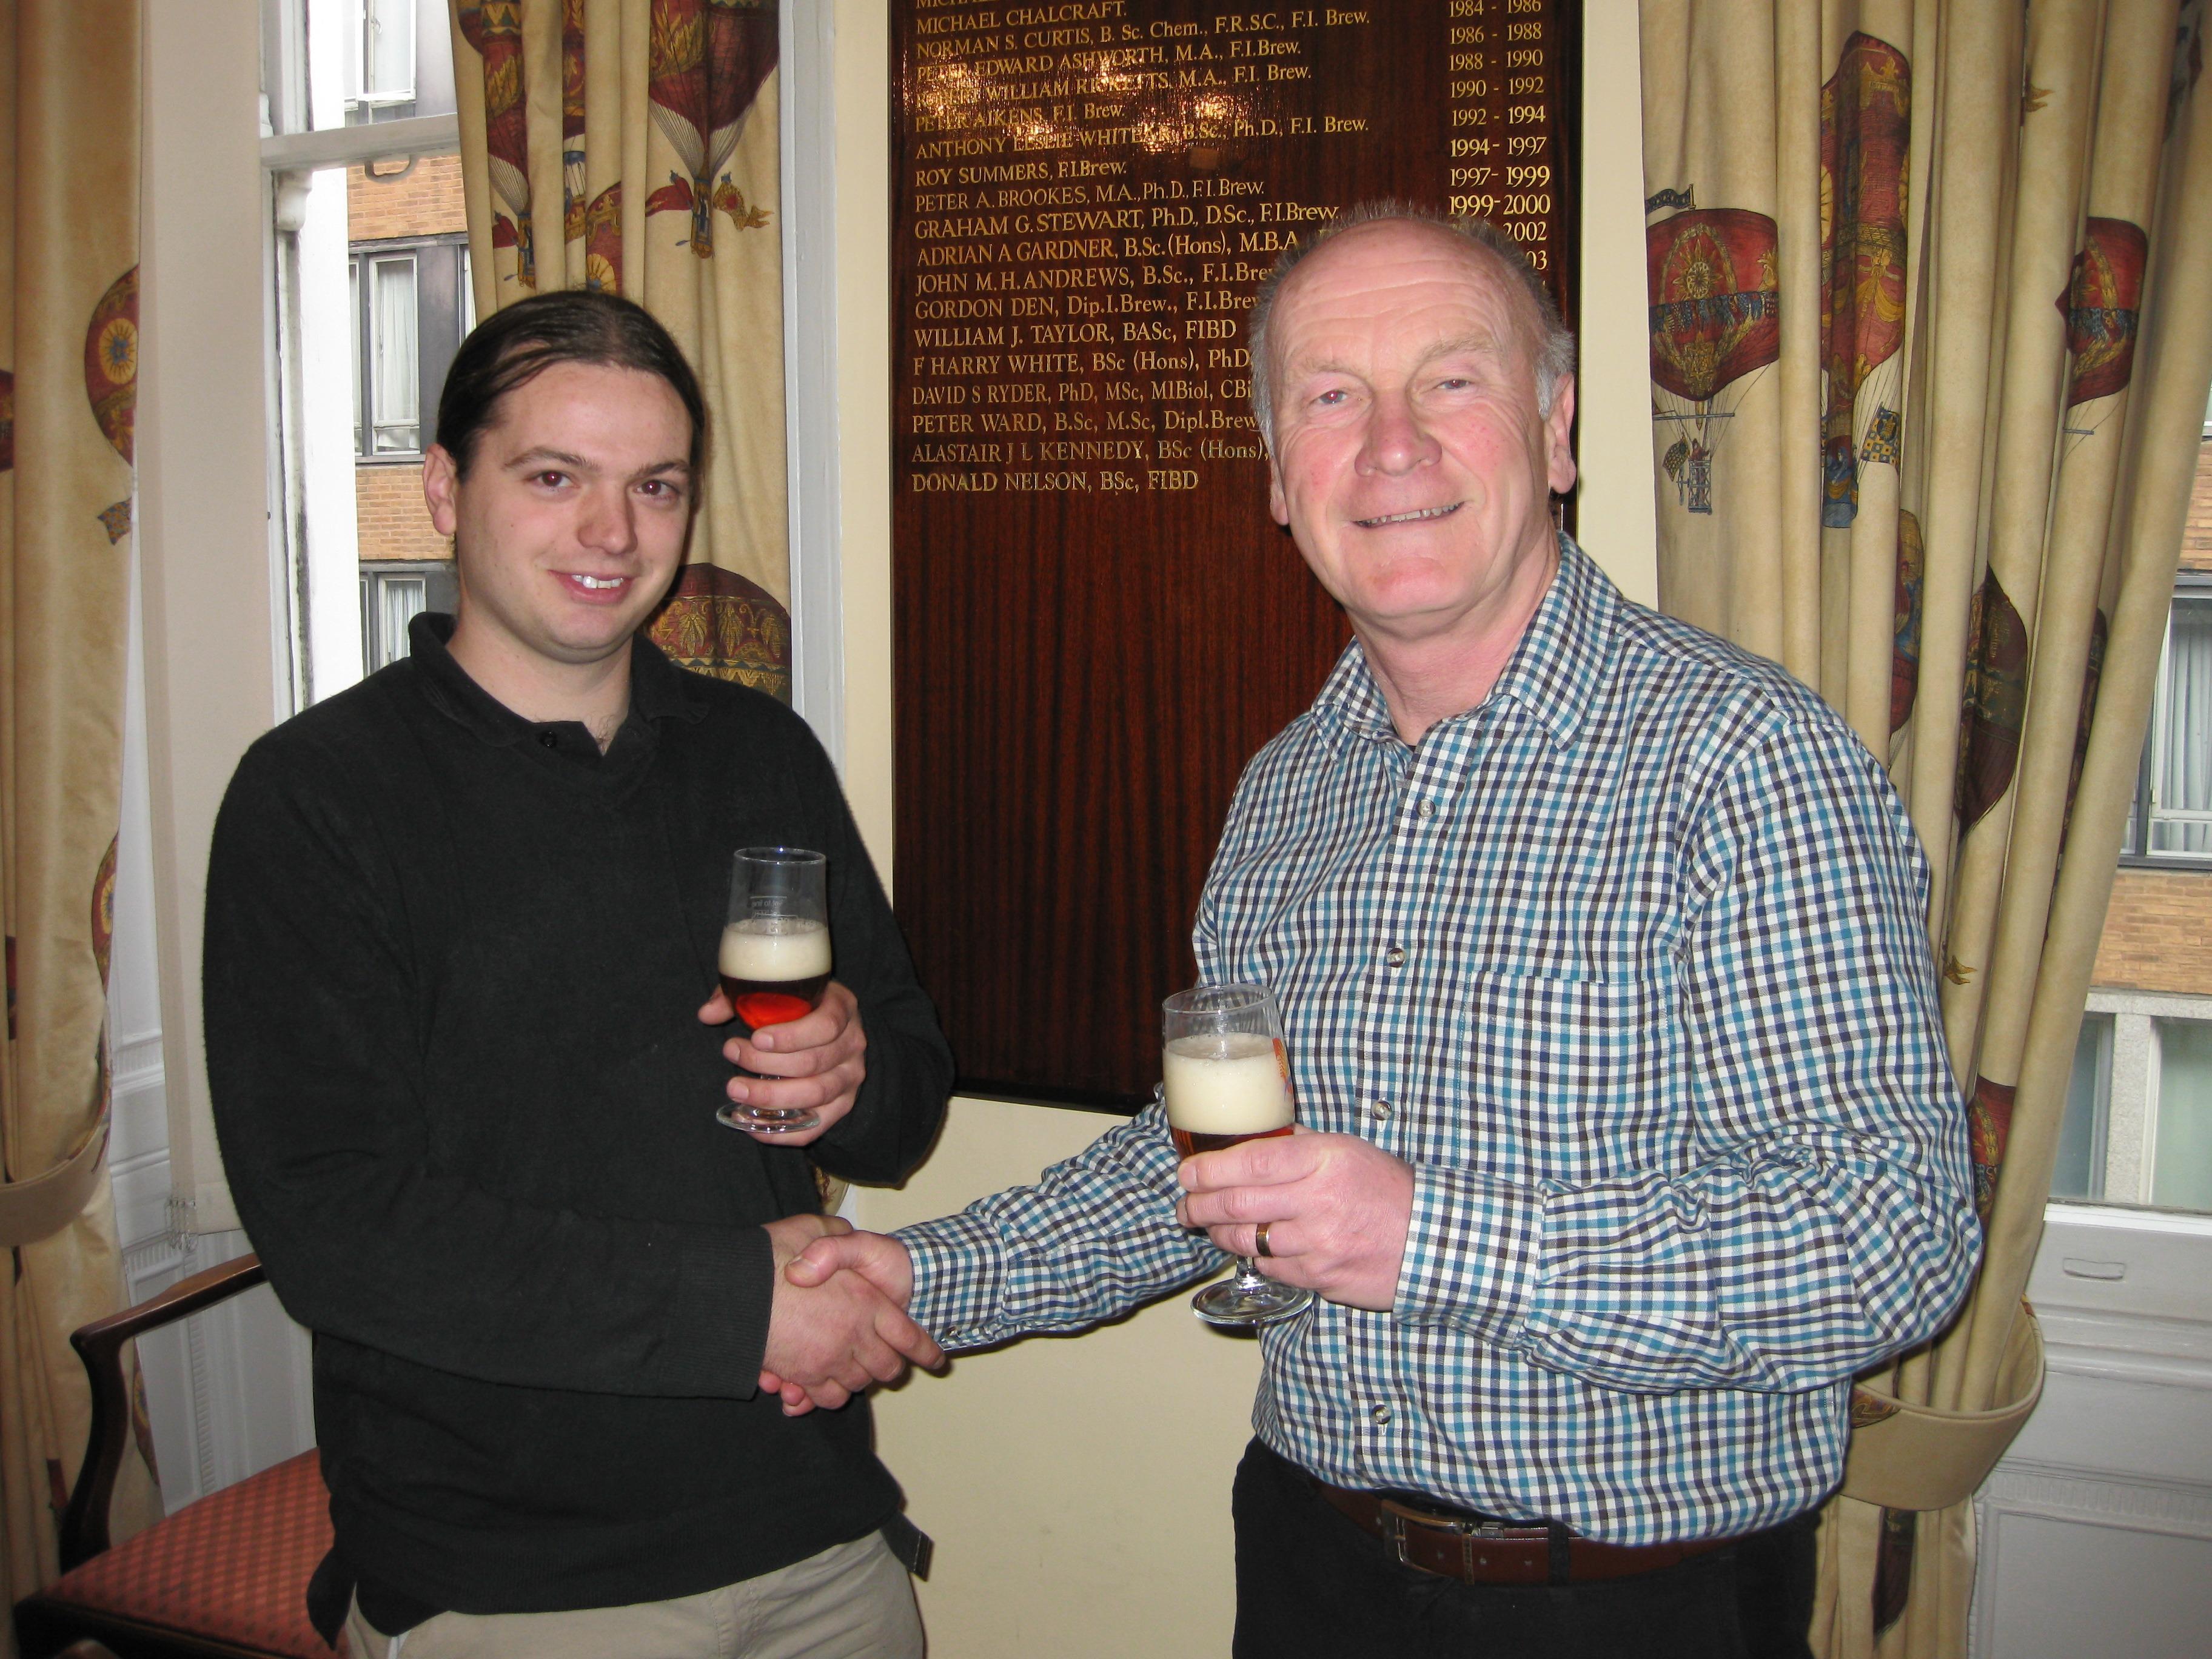 Joseph Thomson, Cornwall, England <br> Accredited: 14th March 2013